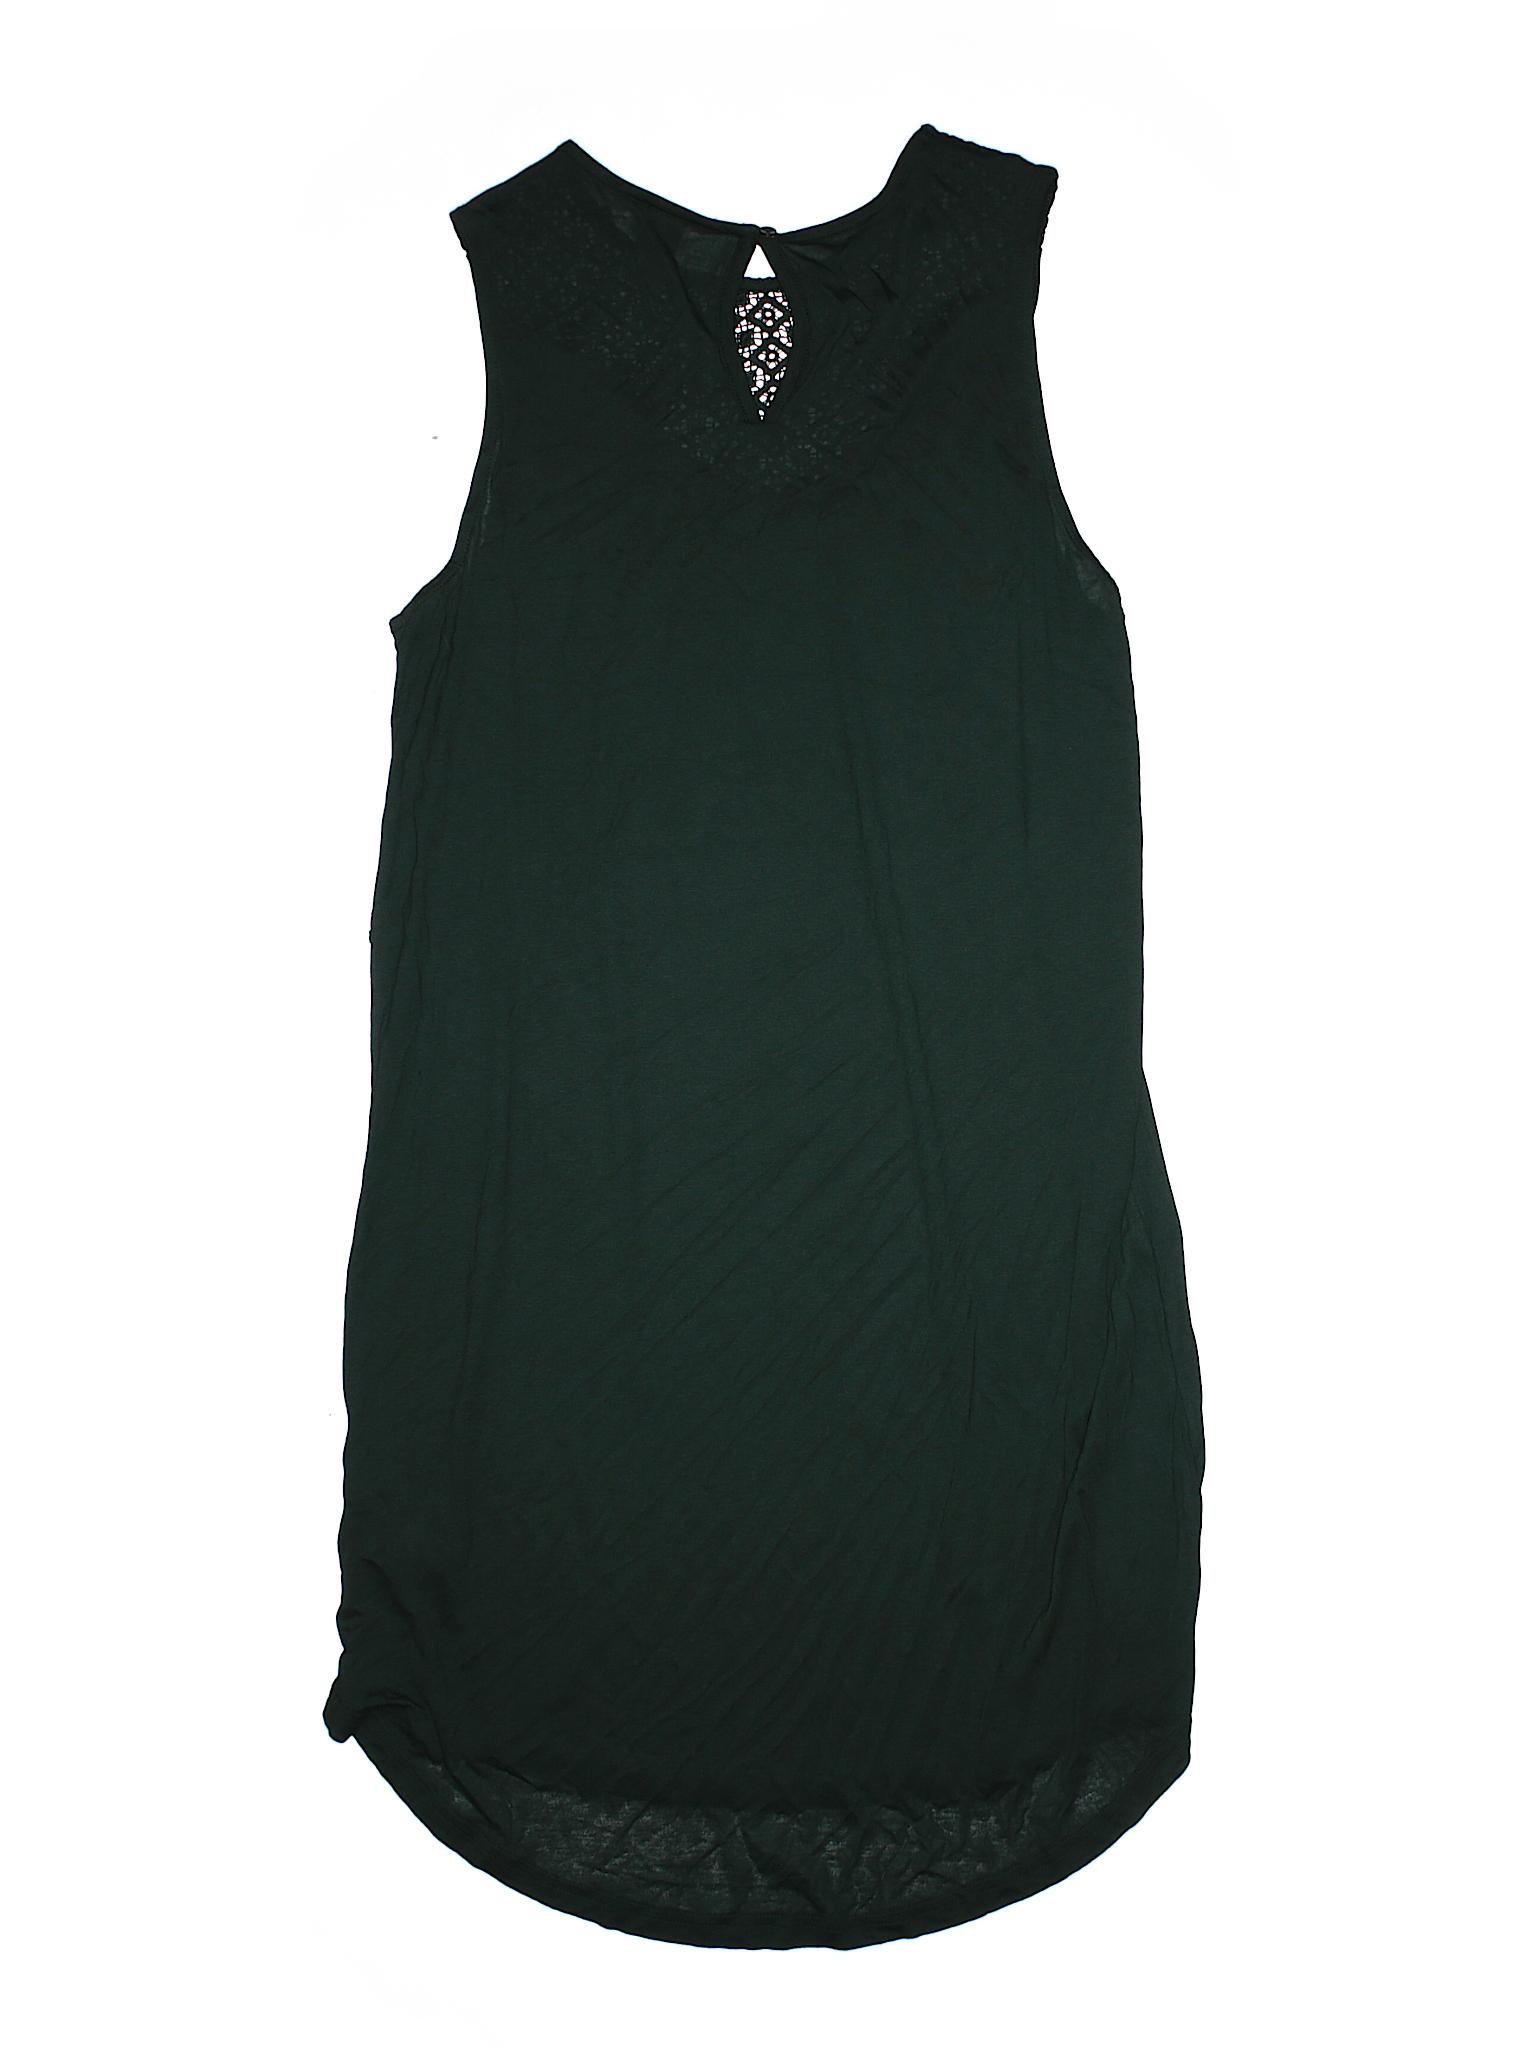 Dress H Boutique Casual amp;M winter xFwpCnq68U